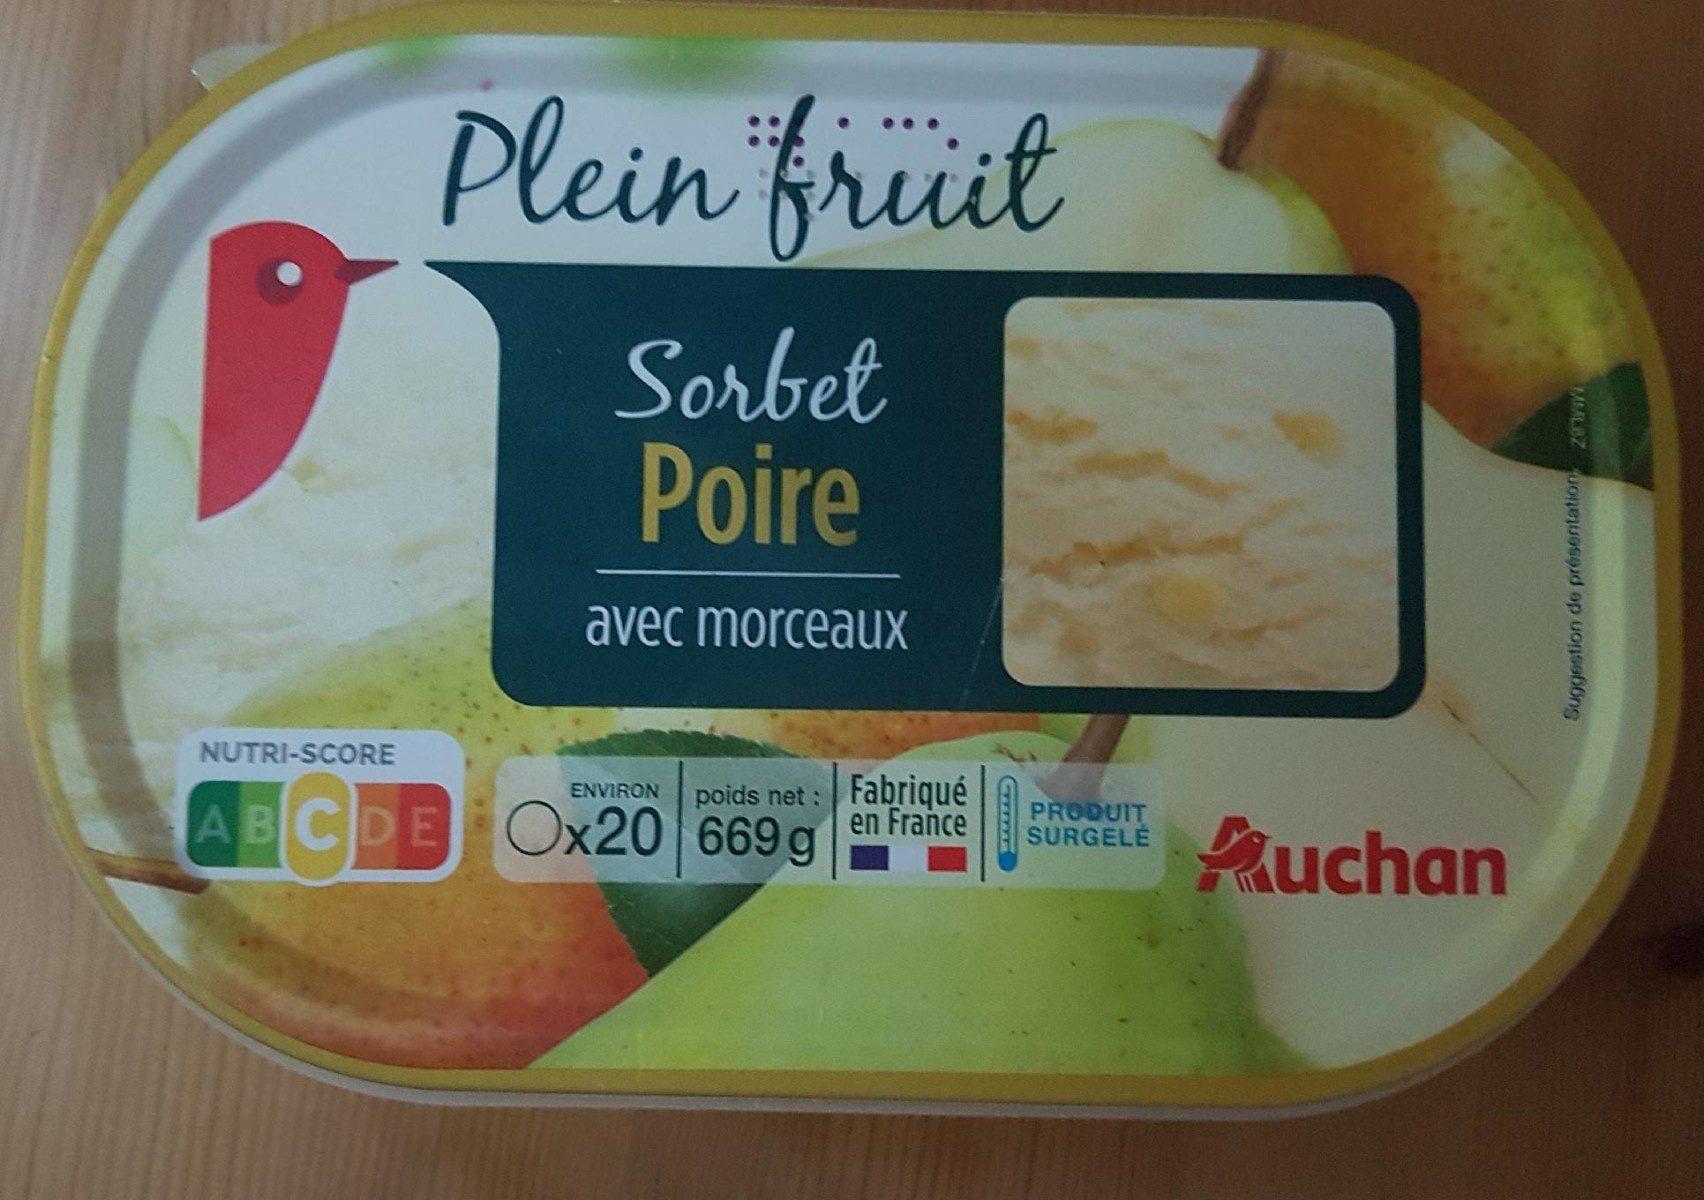 Sorbet Poire - Product